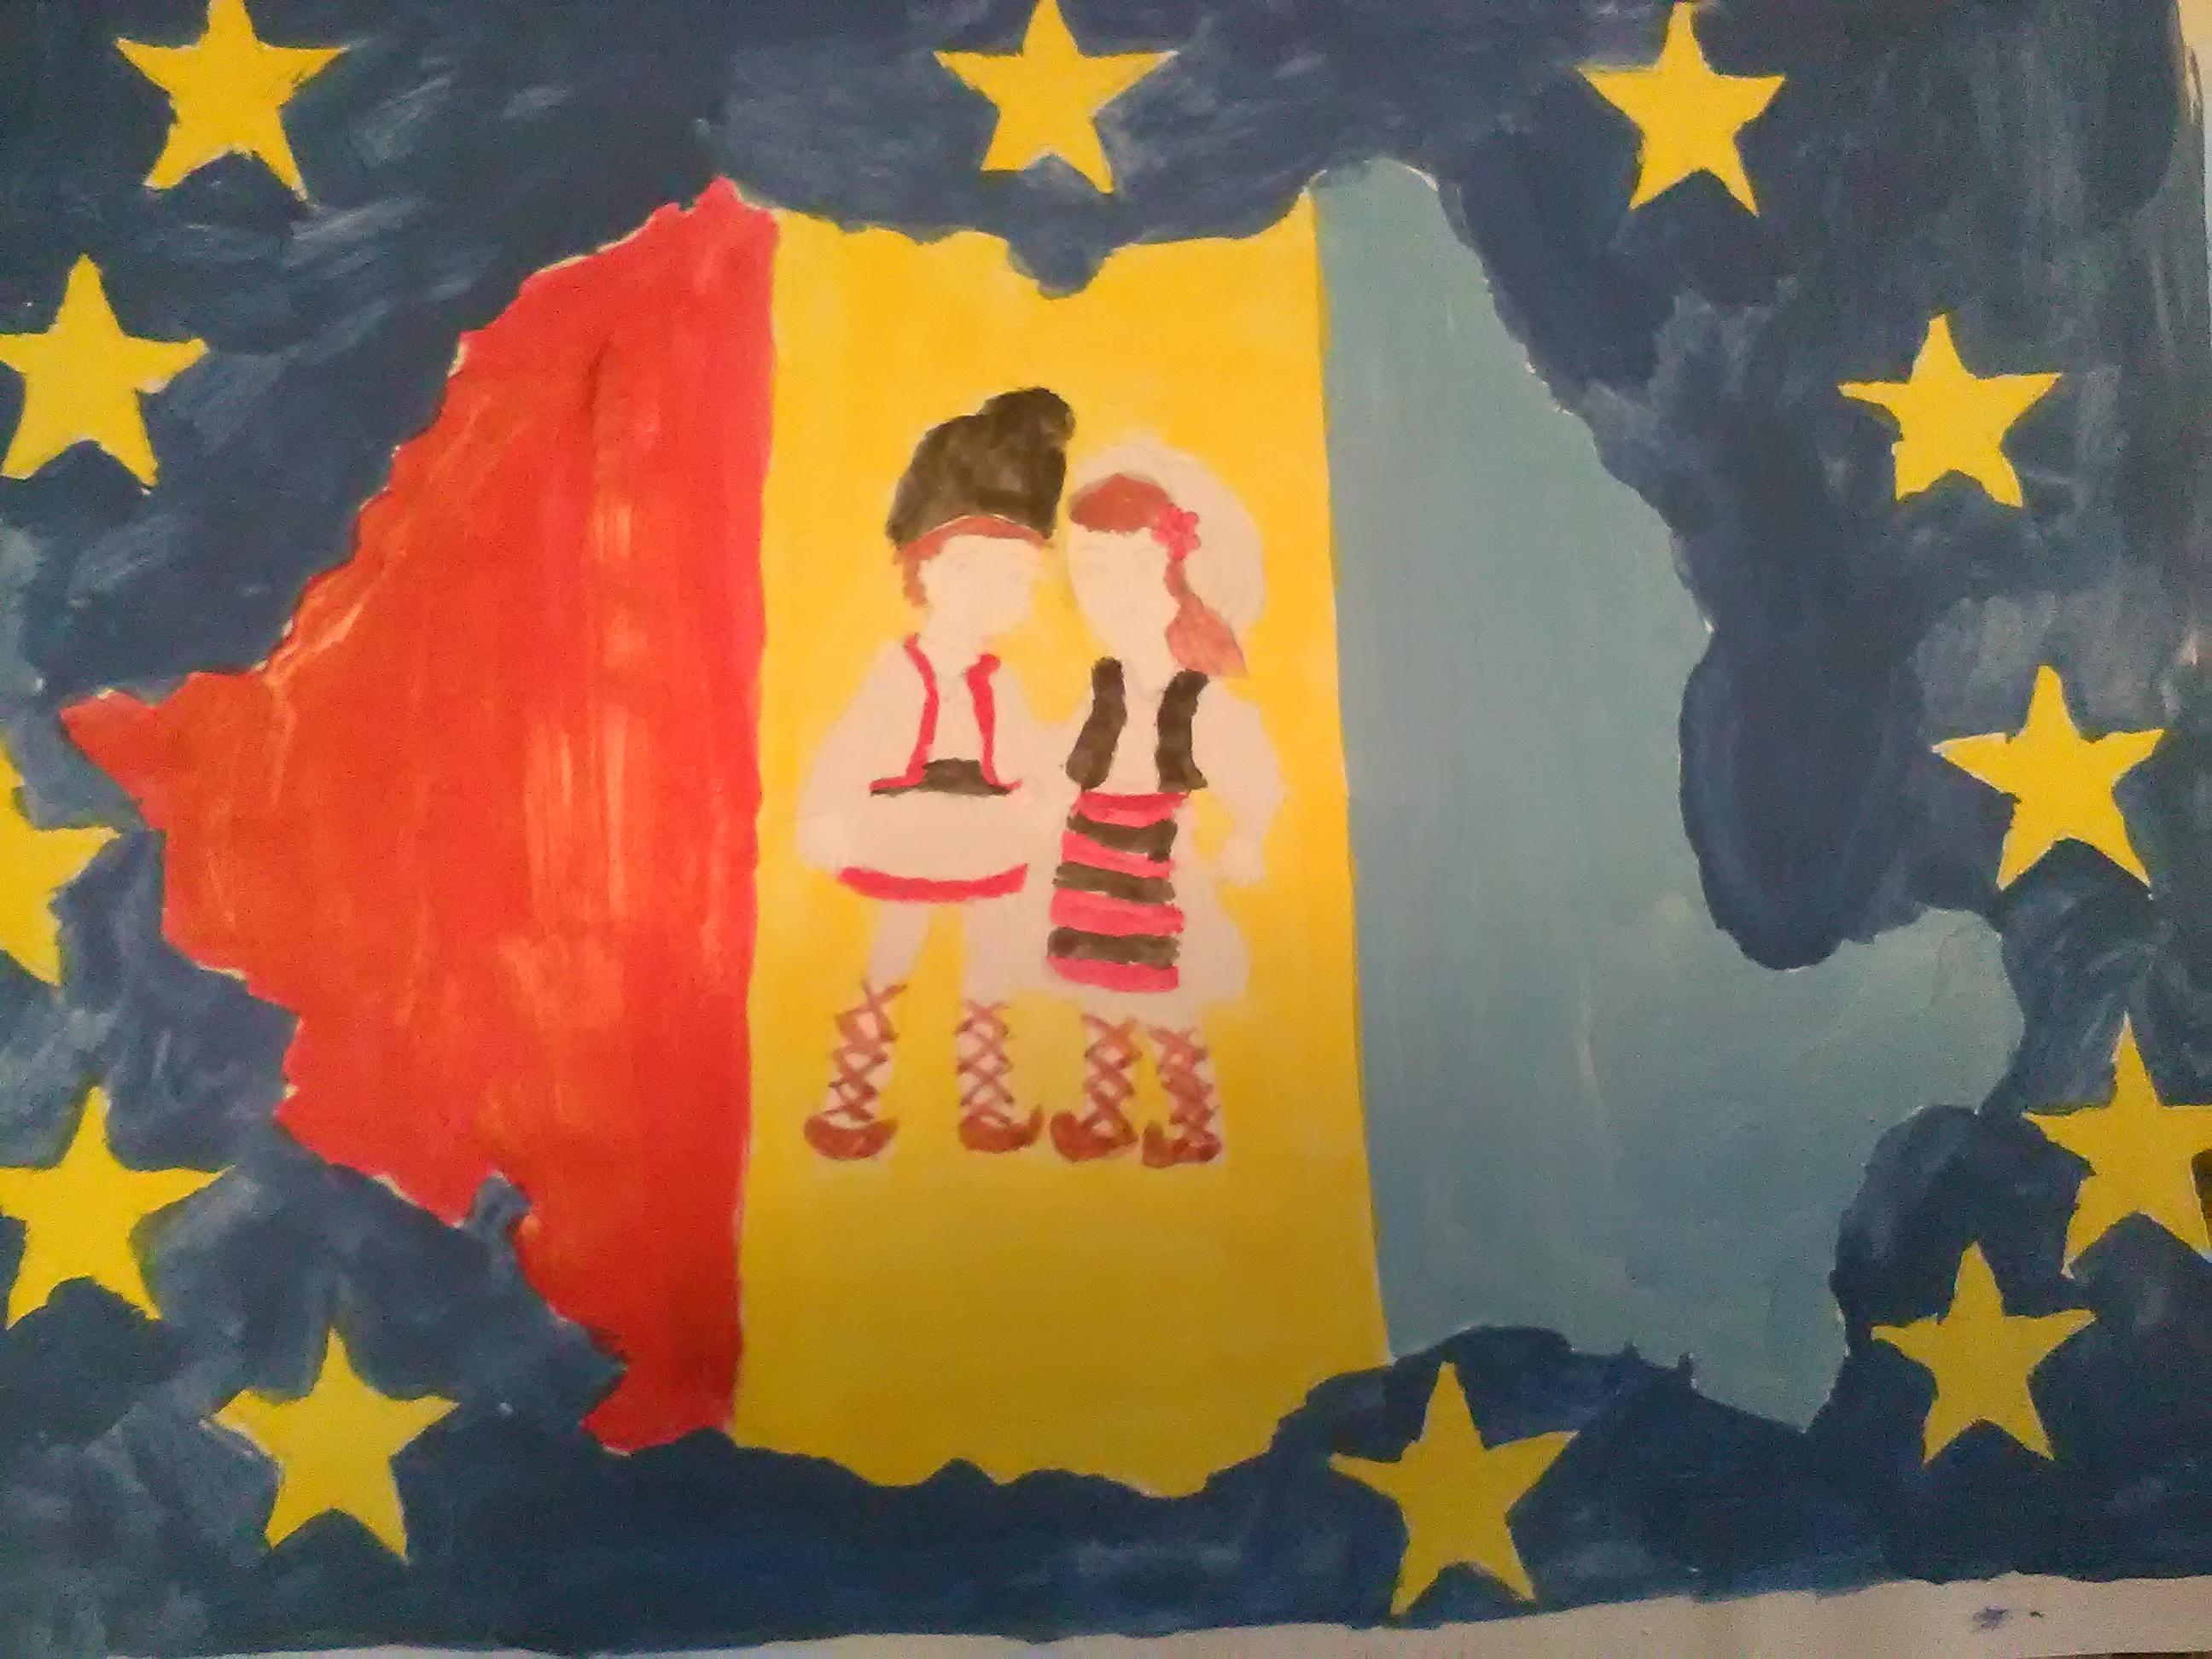 Români buni, cetățeni europeni